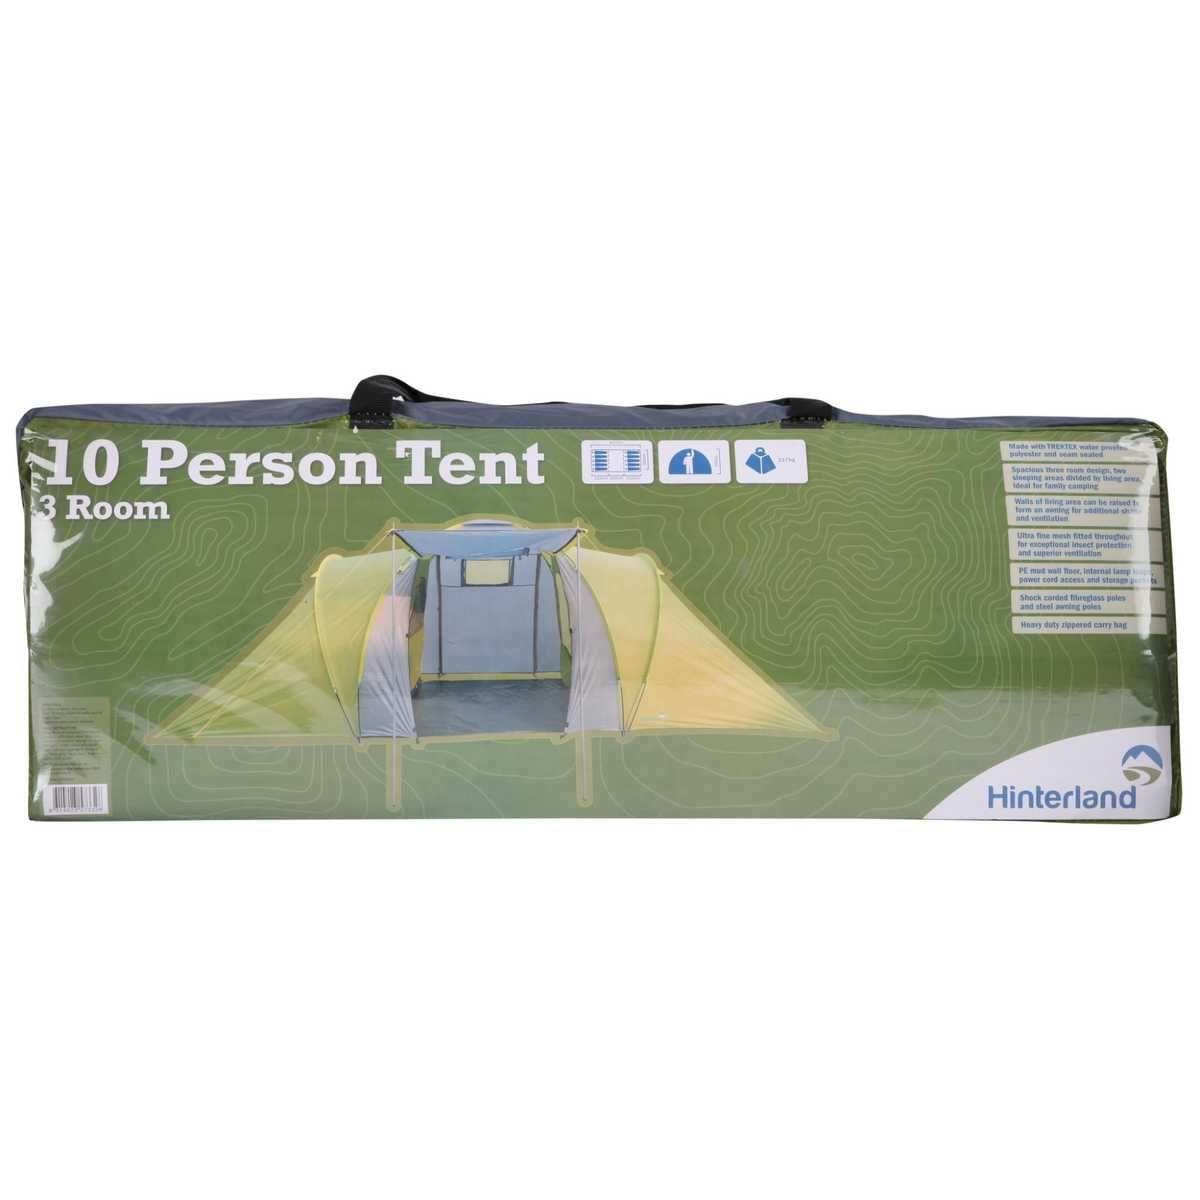 Hinterland 10 Person 3 Room Tent | BIG W | Lets go camping ...